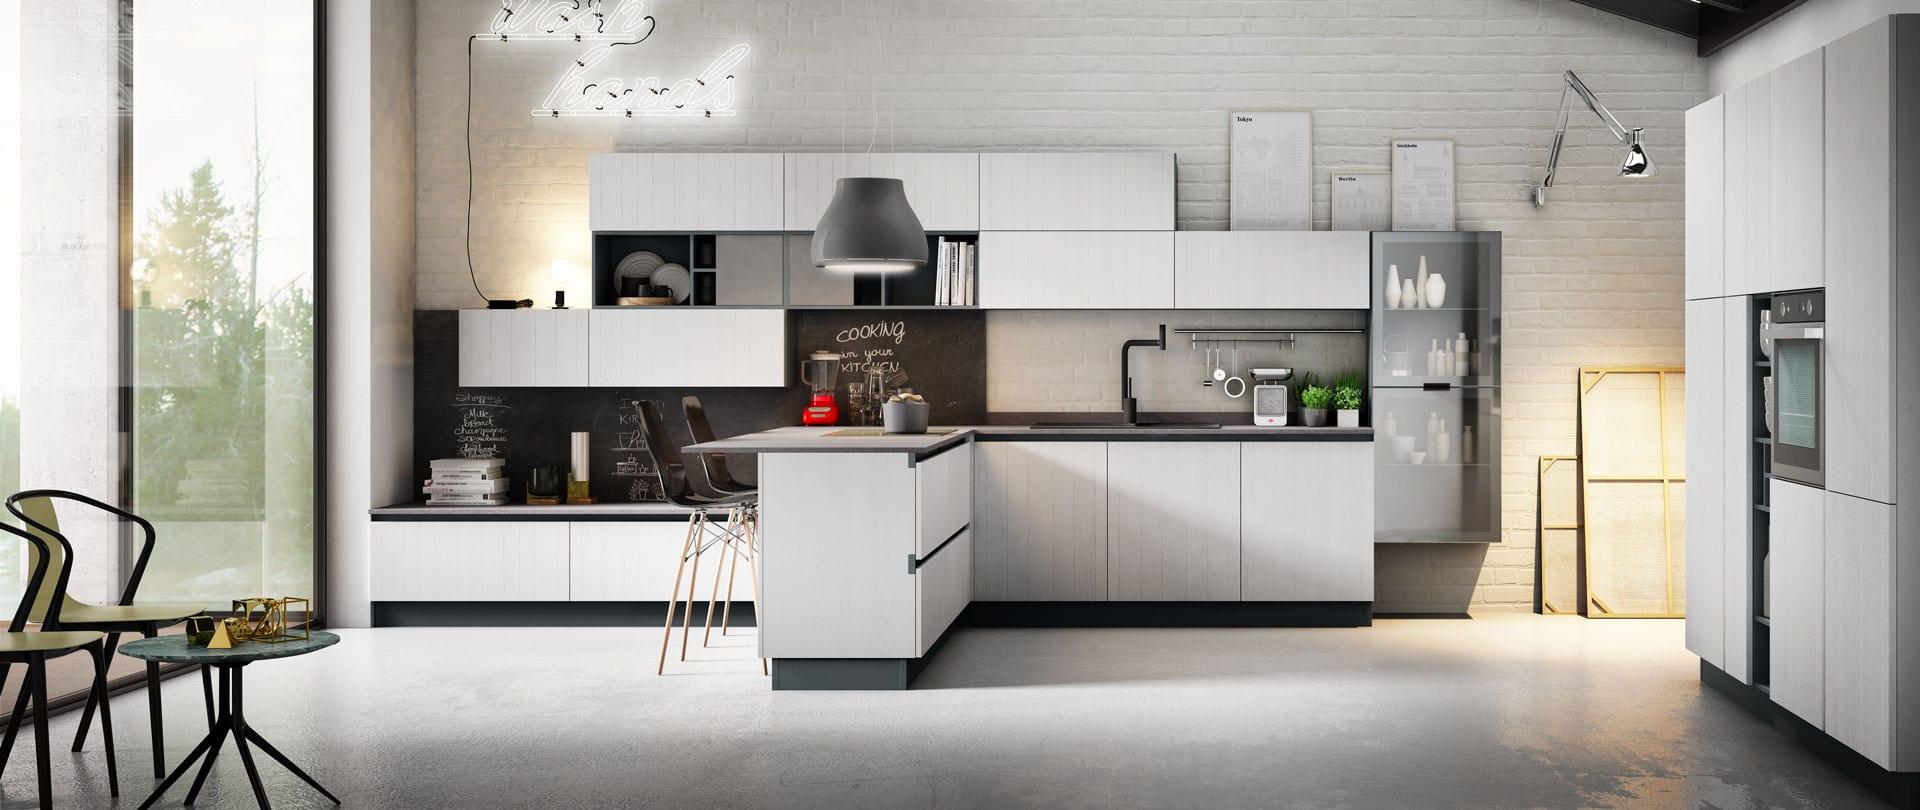 Cucina Mobilturi Matrix | Tutto Mobili, arredamento camere ...